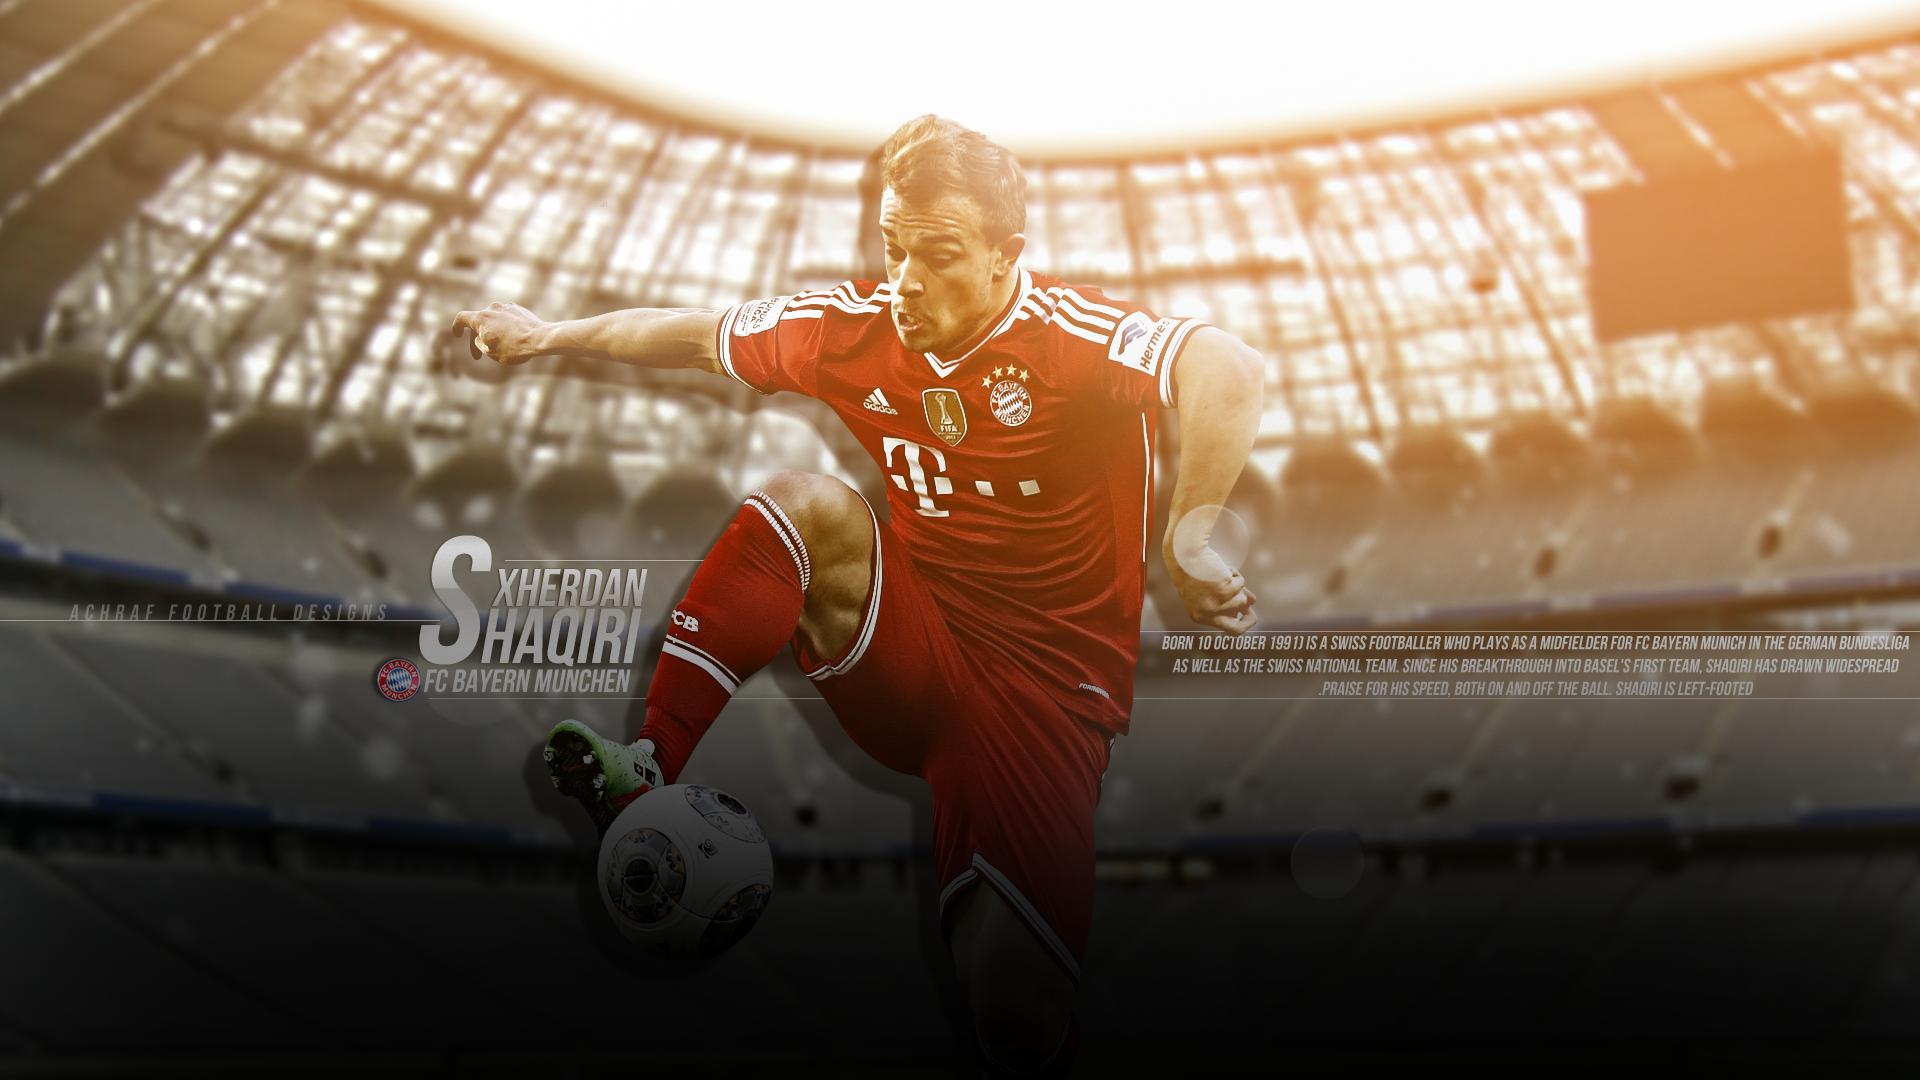 Xherdan Shaqiri Bayern Munich Wallpaper Hd 2014 1 Bayern Munich Wallpapers Bayern Munich Bayern